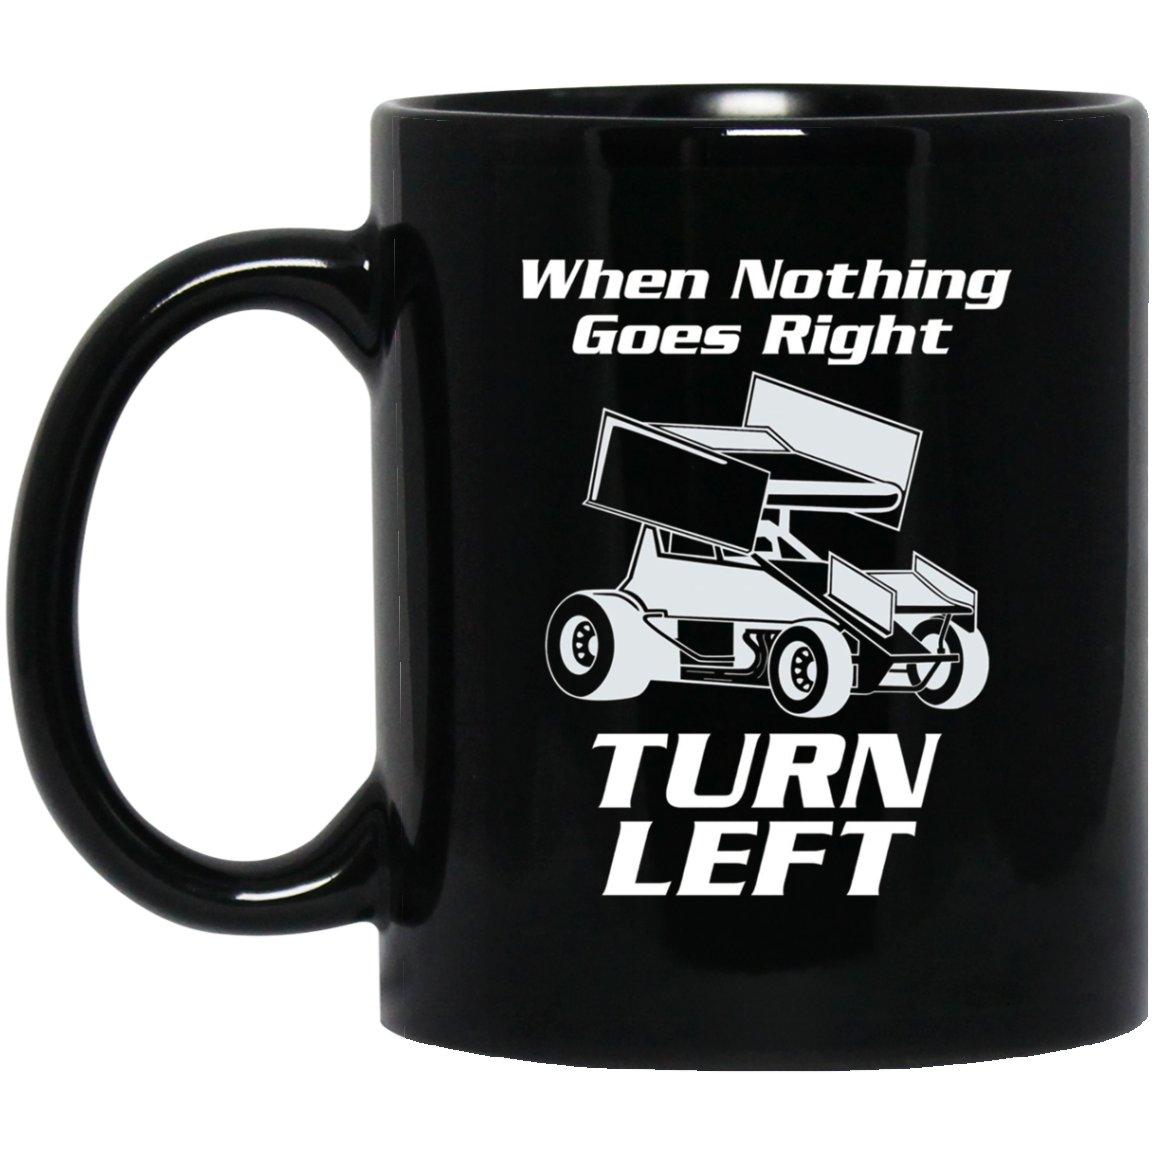 Sprint Car Racing When Nothing Goes Right Turn Left Black  Mug Black Ceramic 11oz Coffee Tea Cup